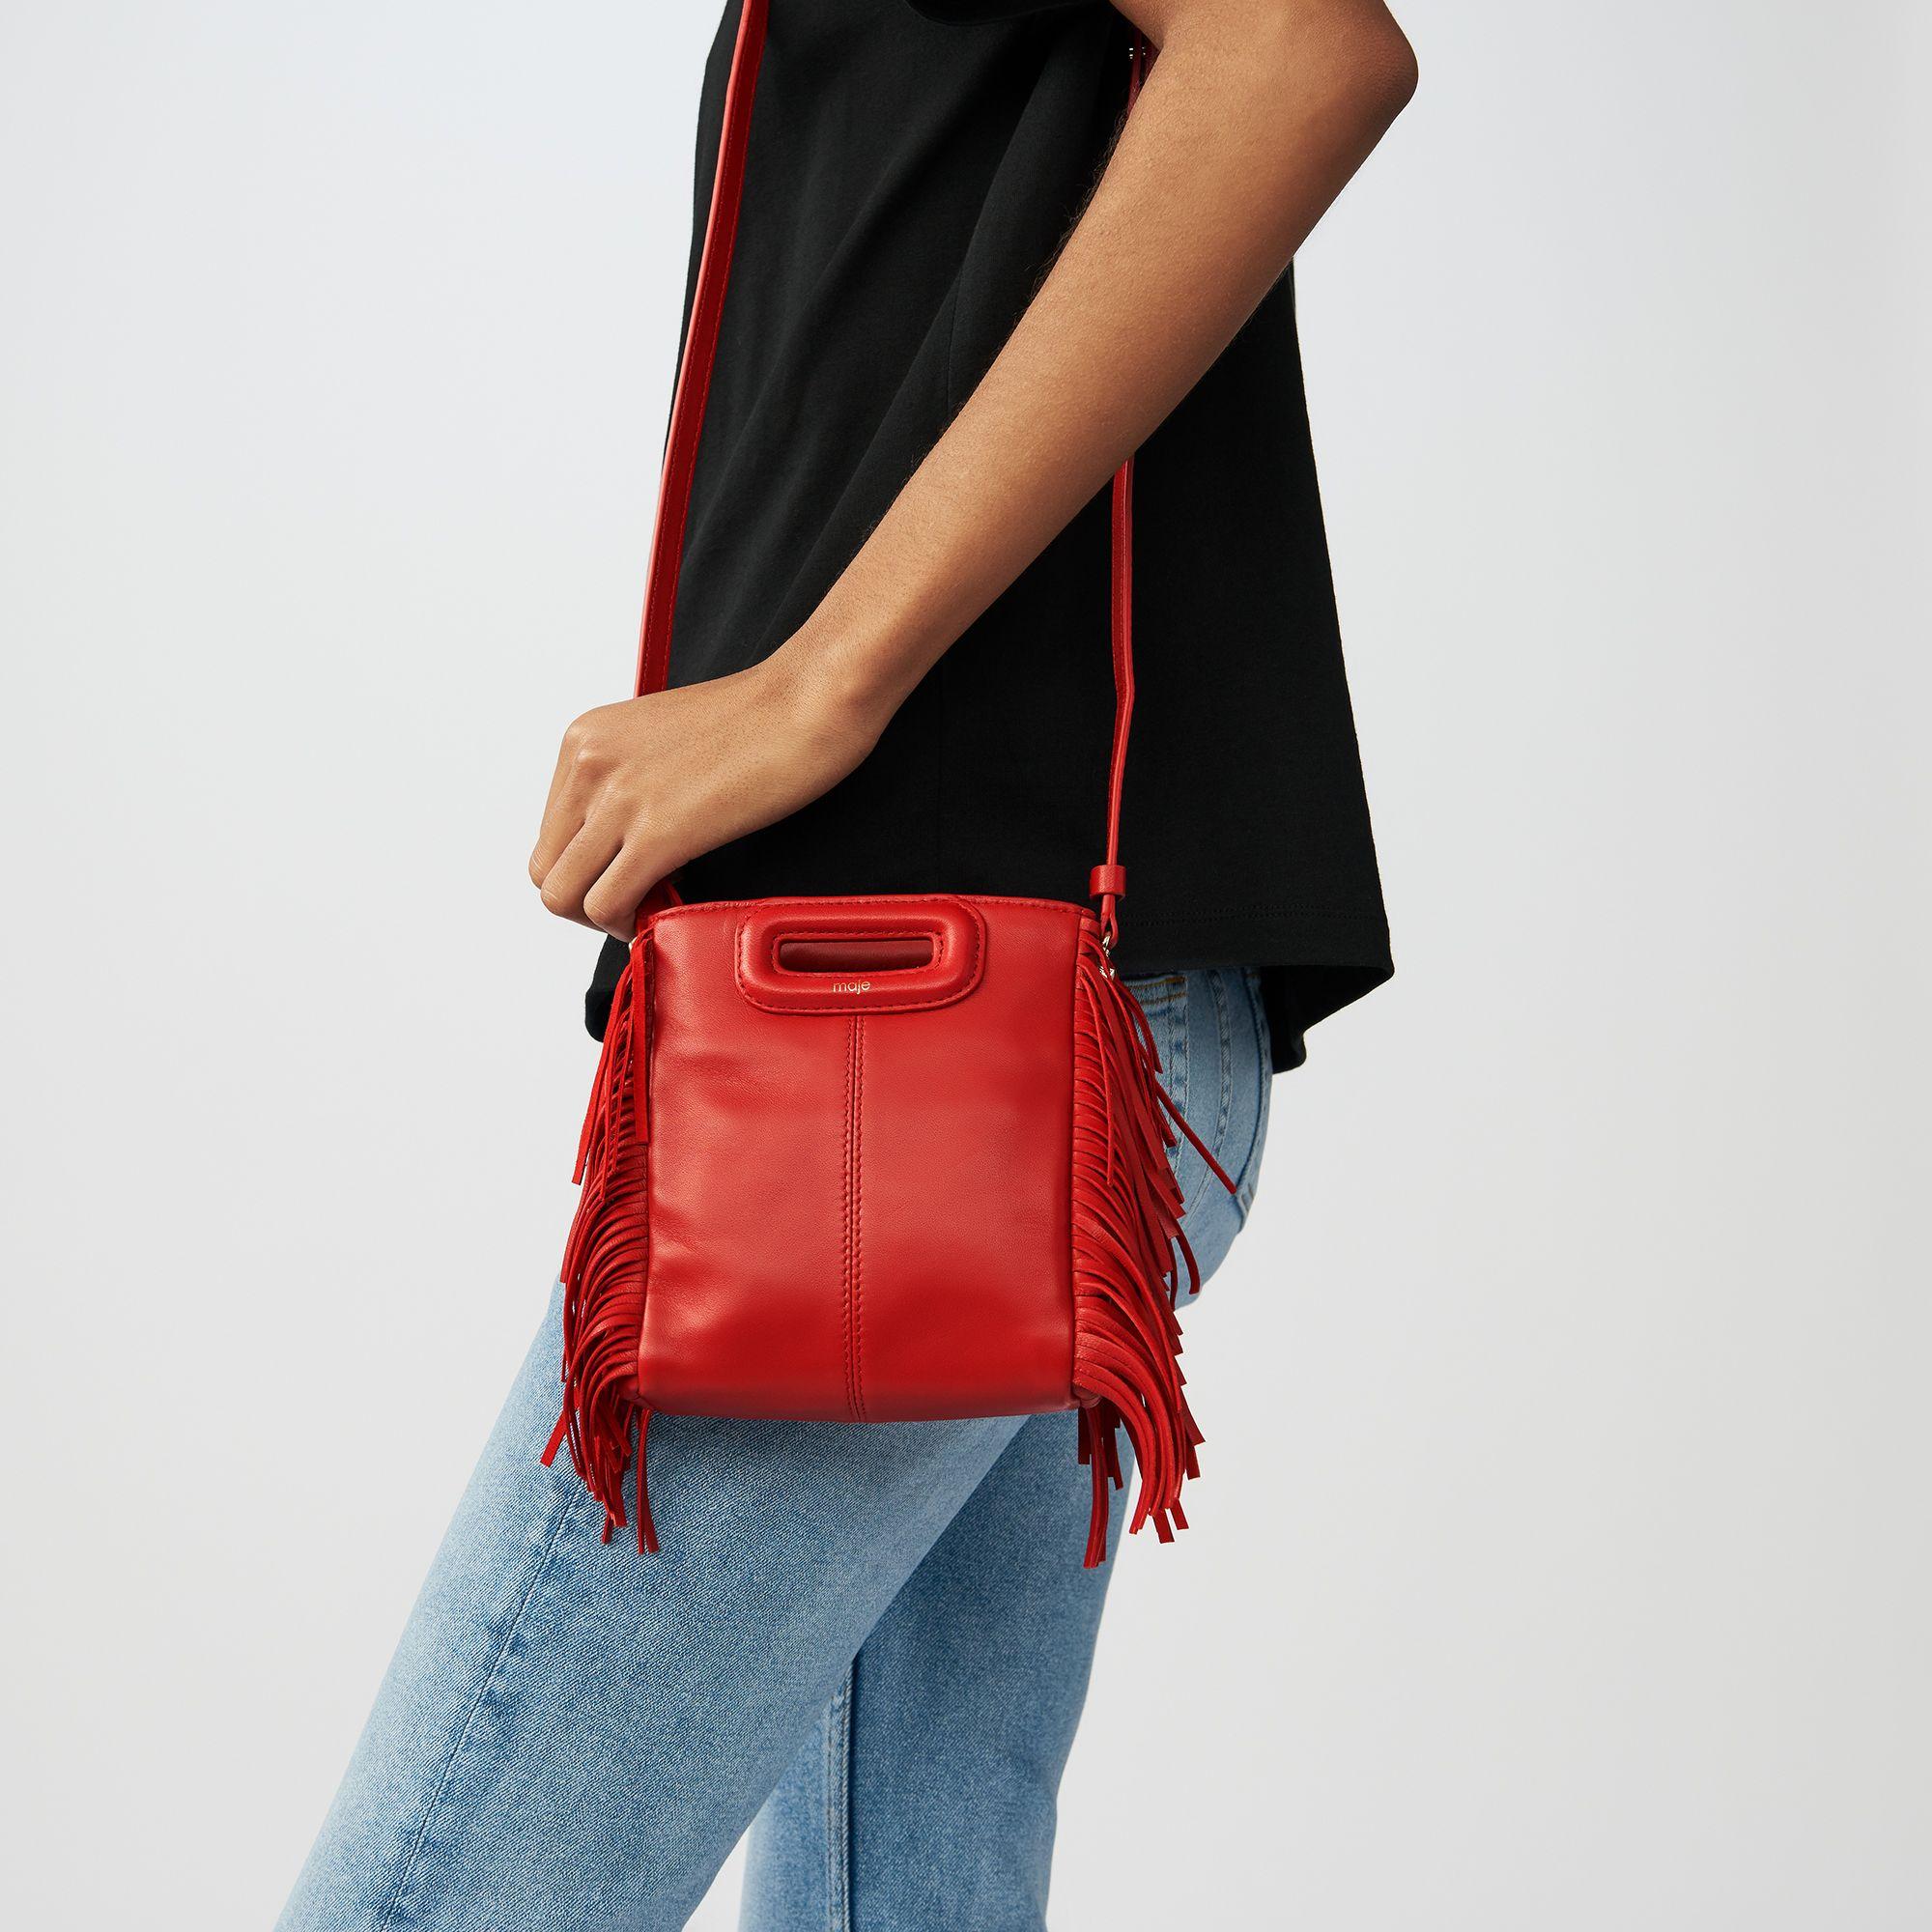 bbac94900b Sac M Mini en cuir avec franges | Maje M Mini bag | Mini Bag, Bags ...